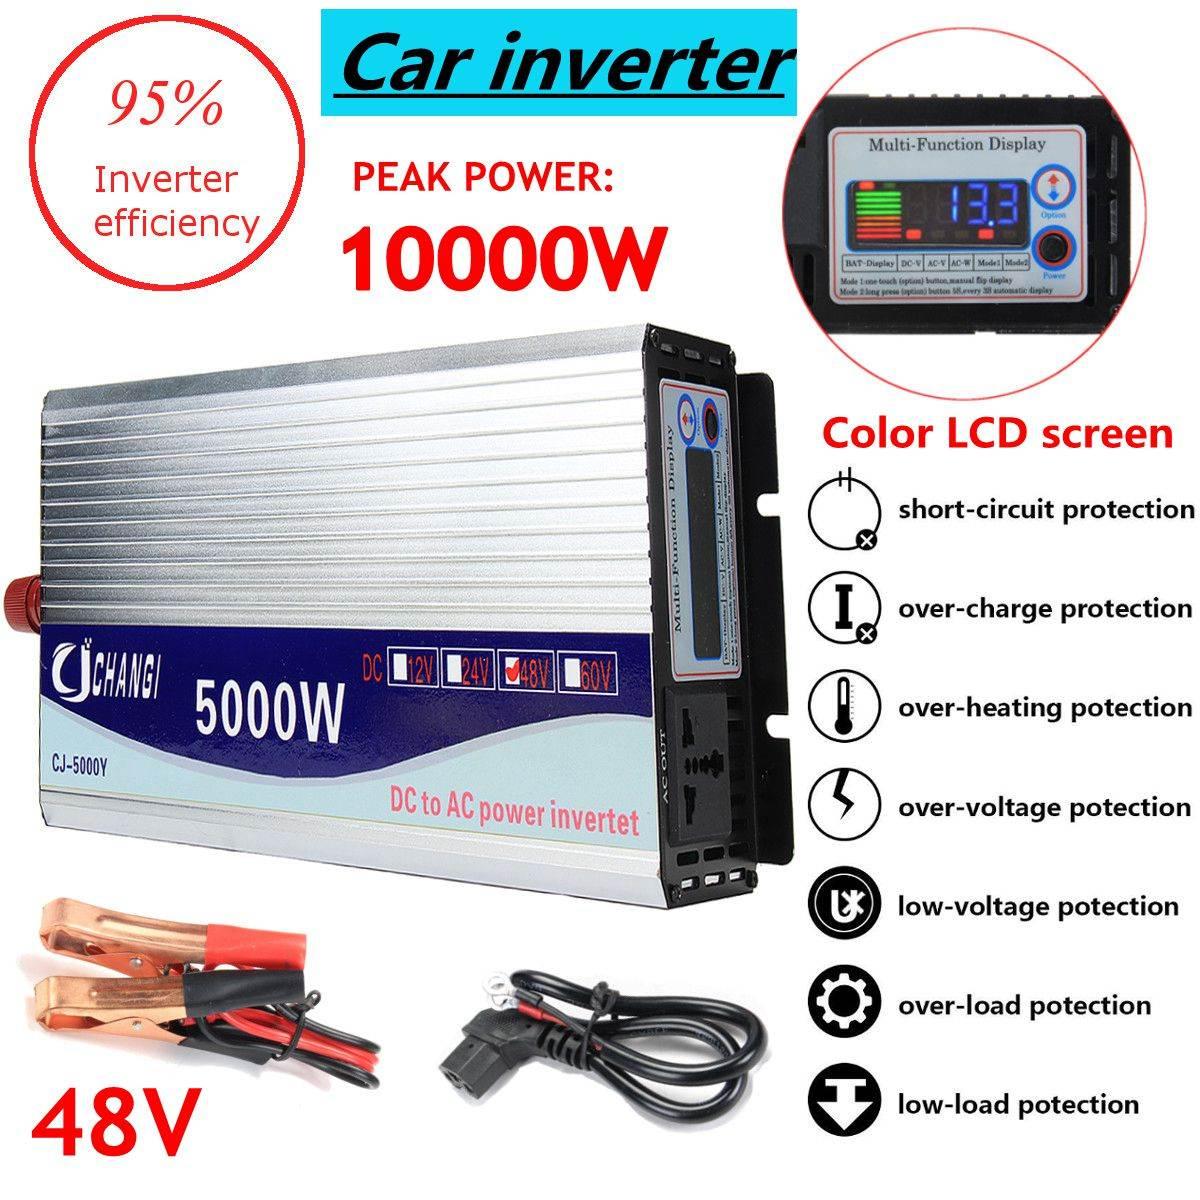 Onduleur 12 v/24 v/48 v 220 v 5000 w 10000 w Pic-Onde sinusoïdale Modifiée puissance Tension transformateur Onduleur Convertisseur + LCD affichage